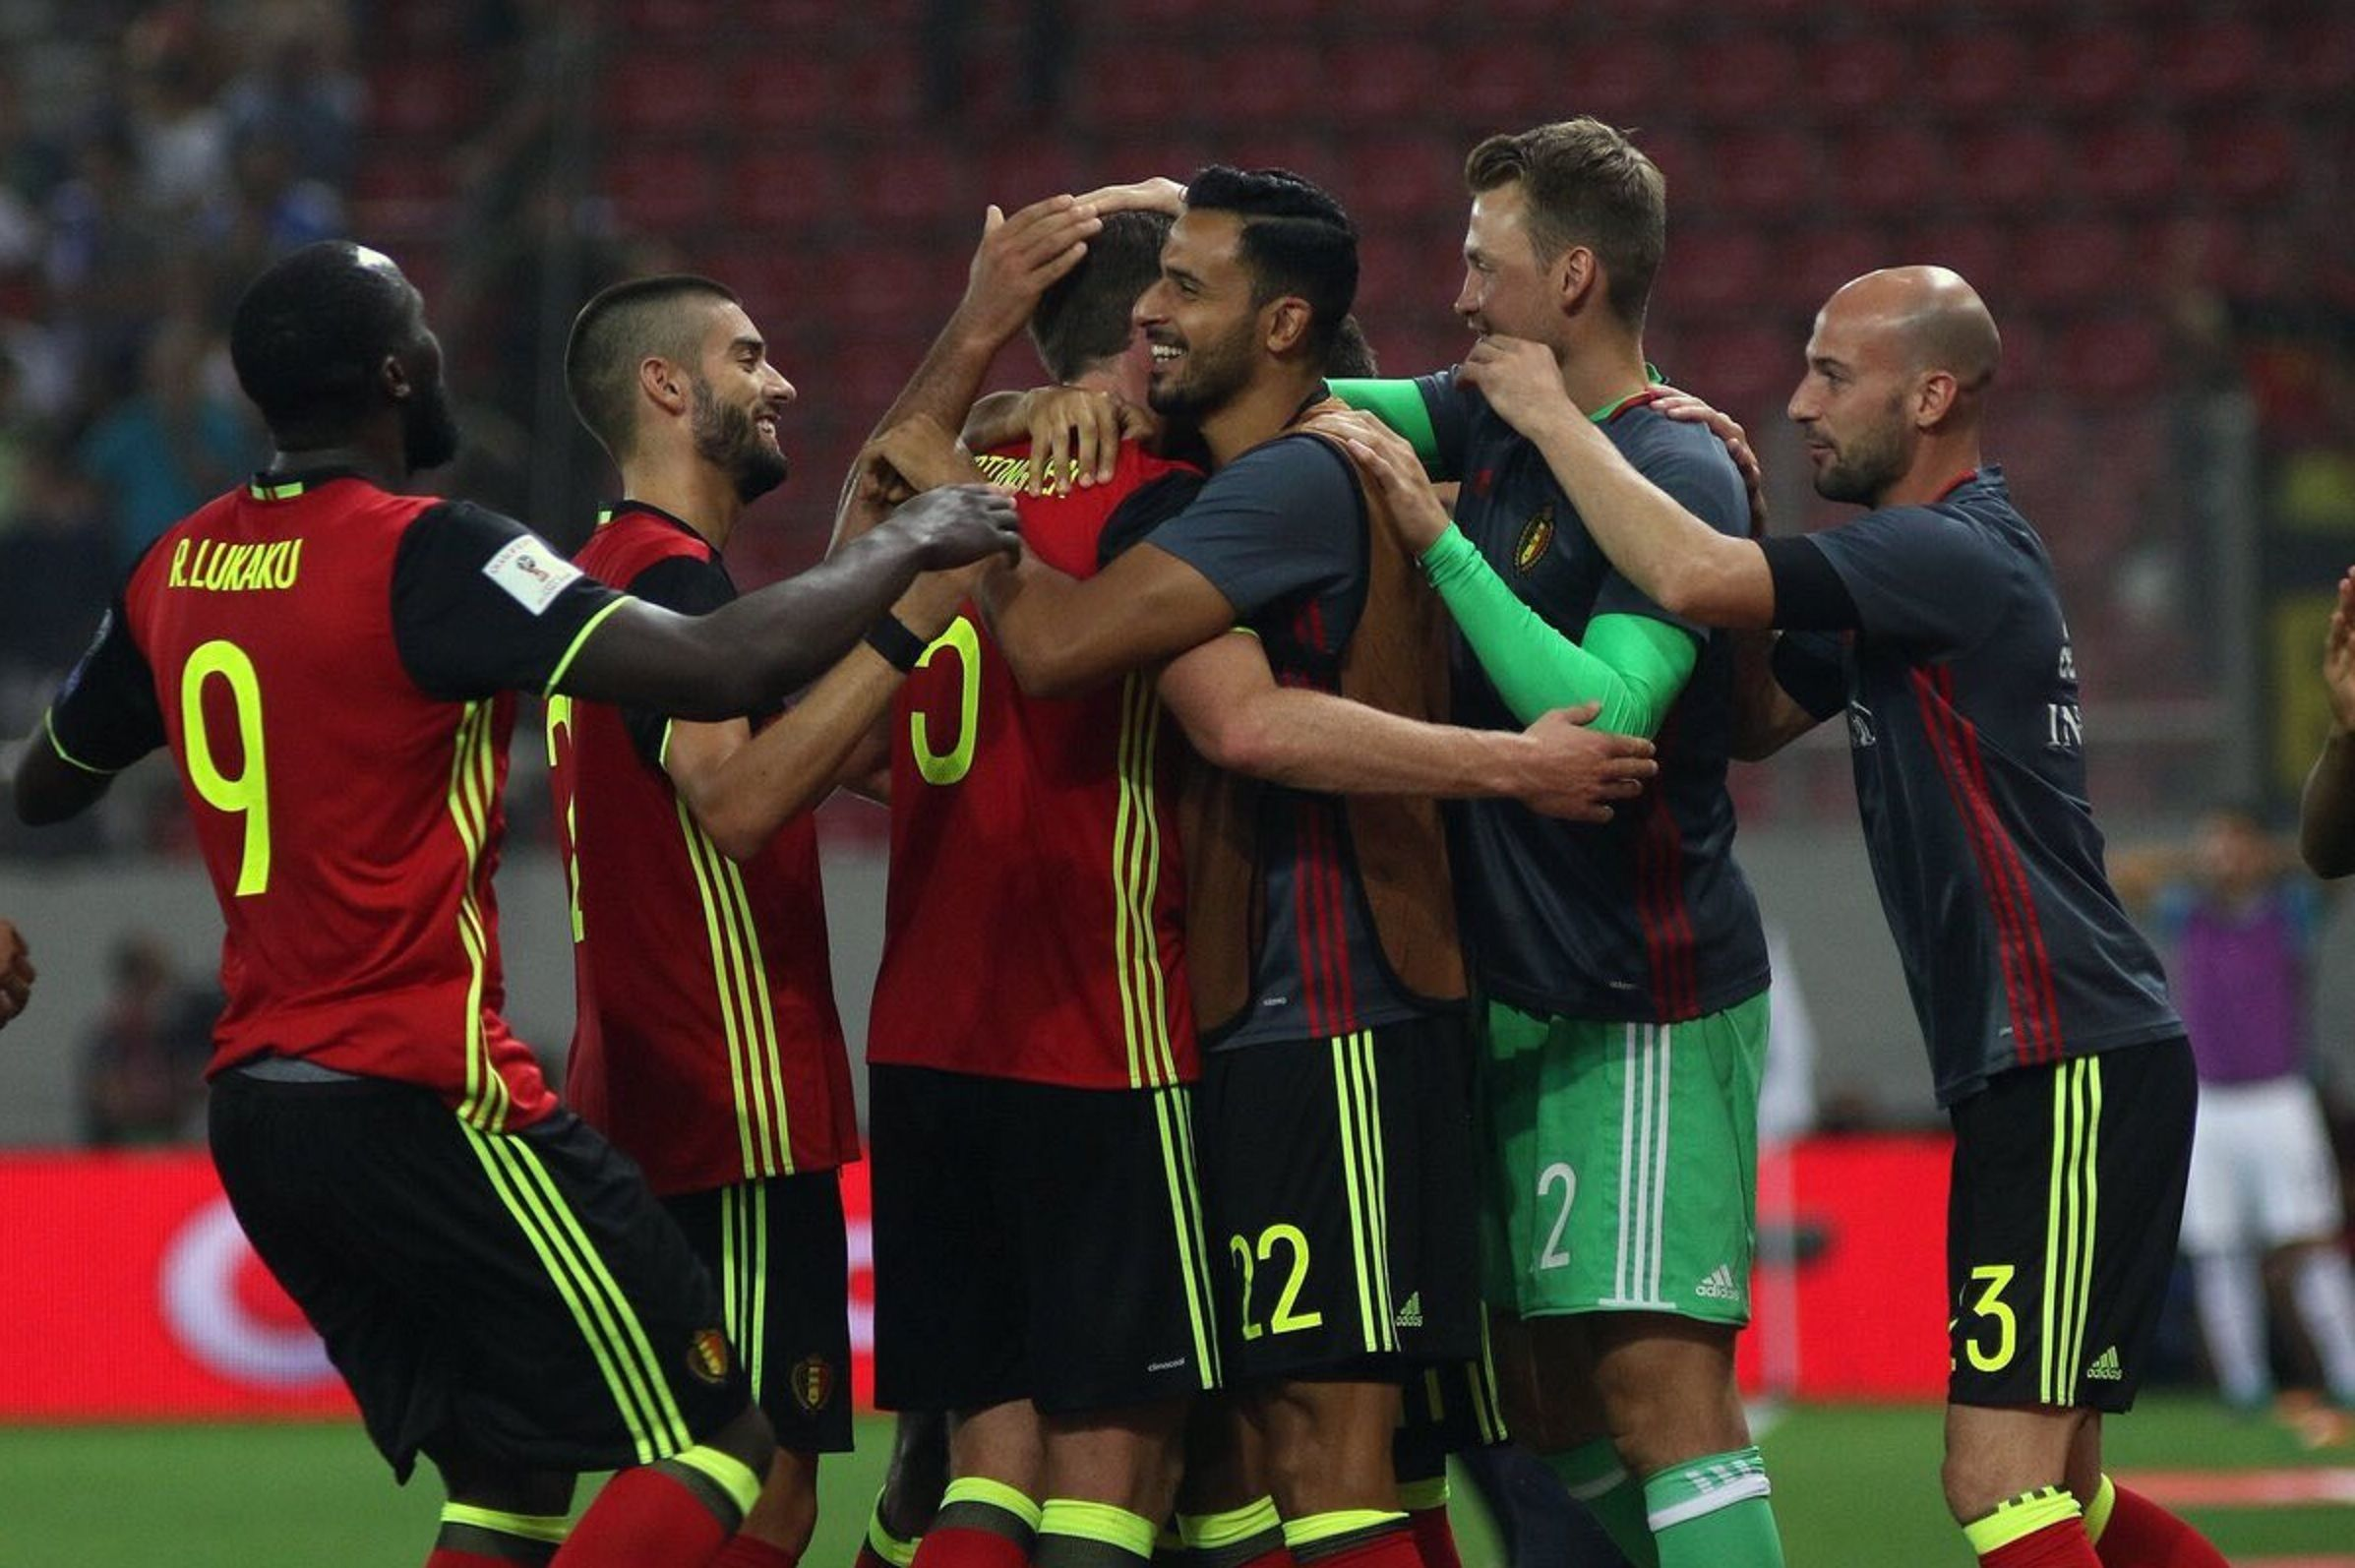 Bélgica es el sexto equipo en sacar pasaje a Rusia 2018